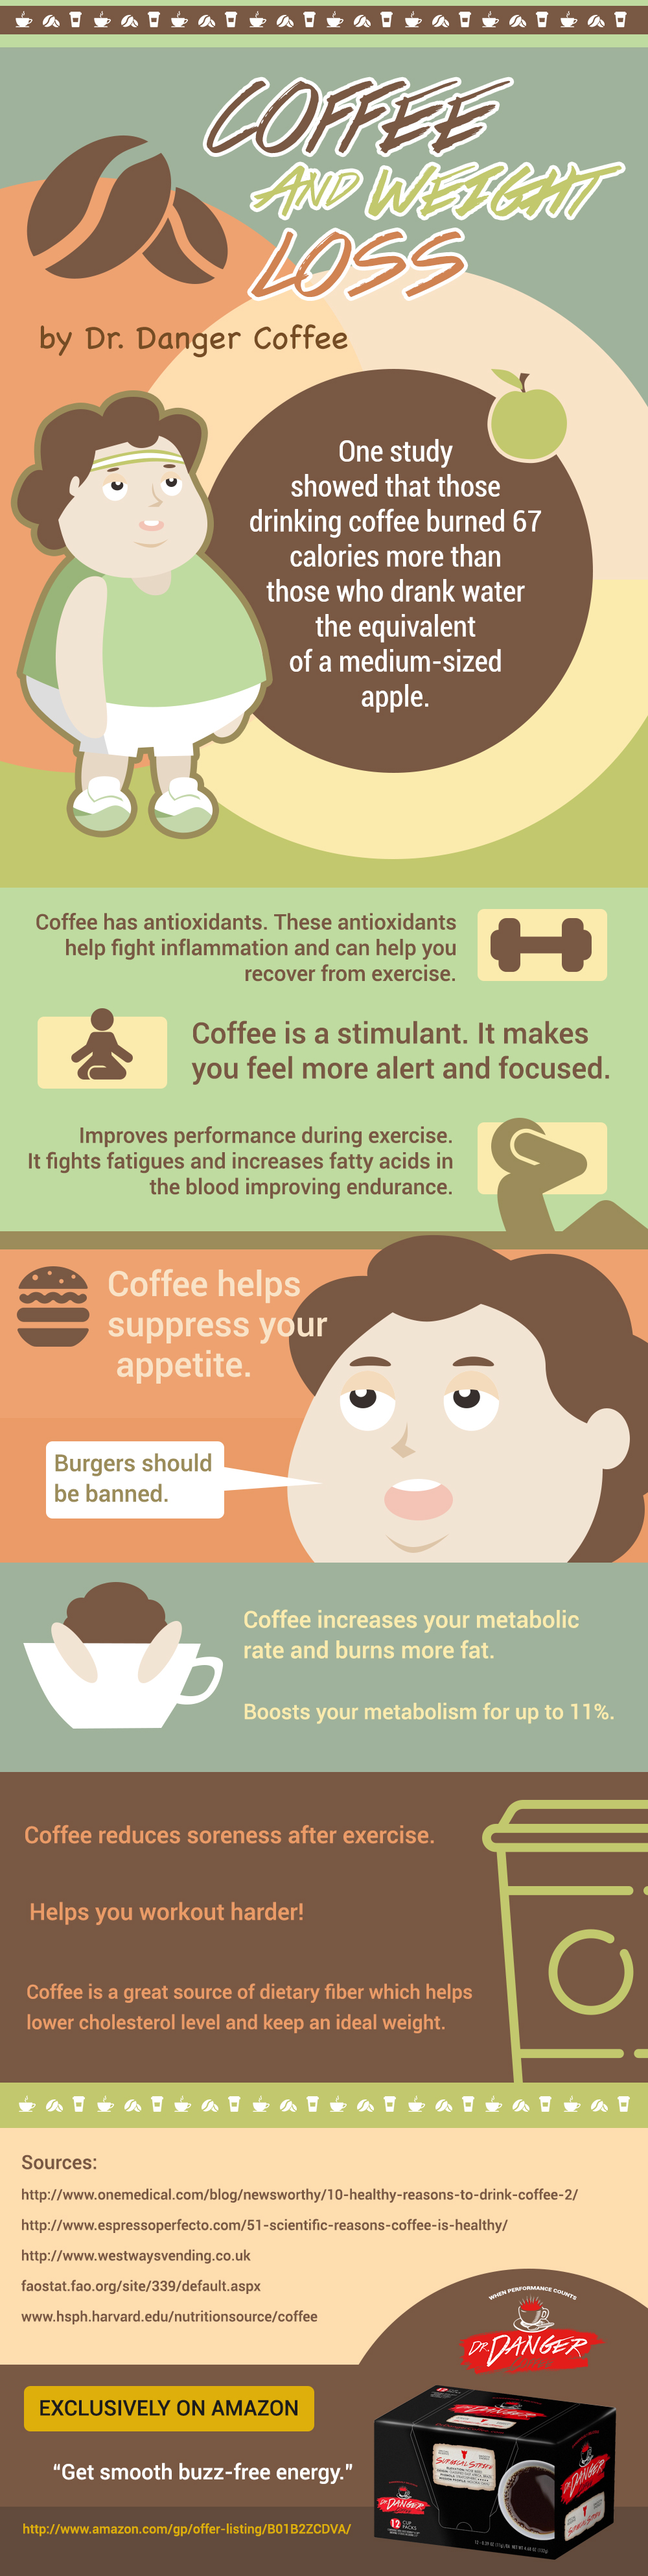 Ayurvedic medicine to reduce belly fat